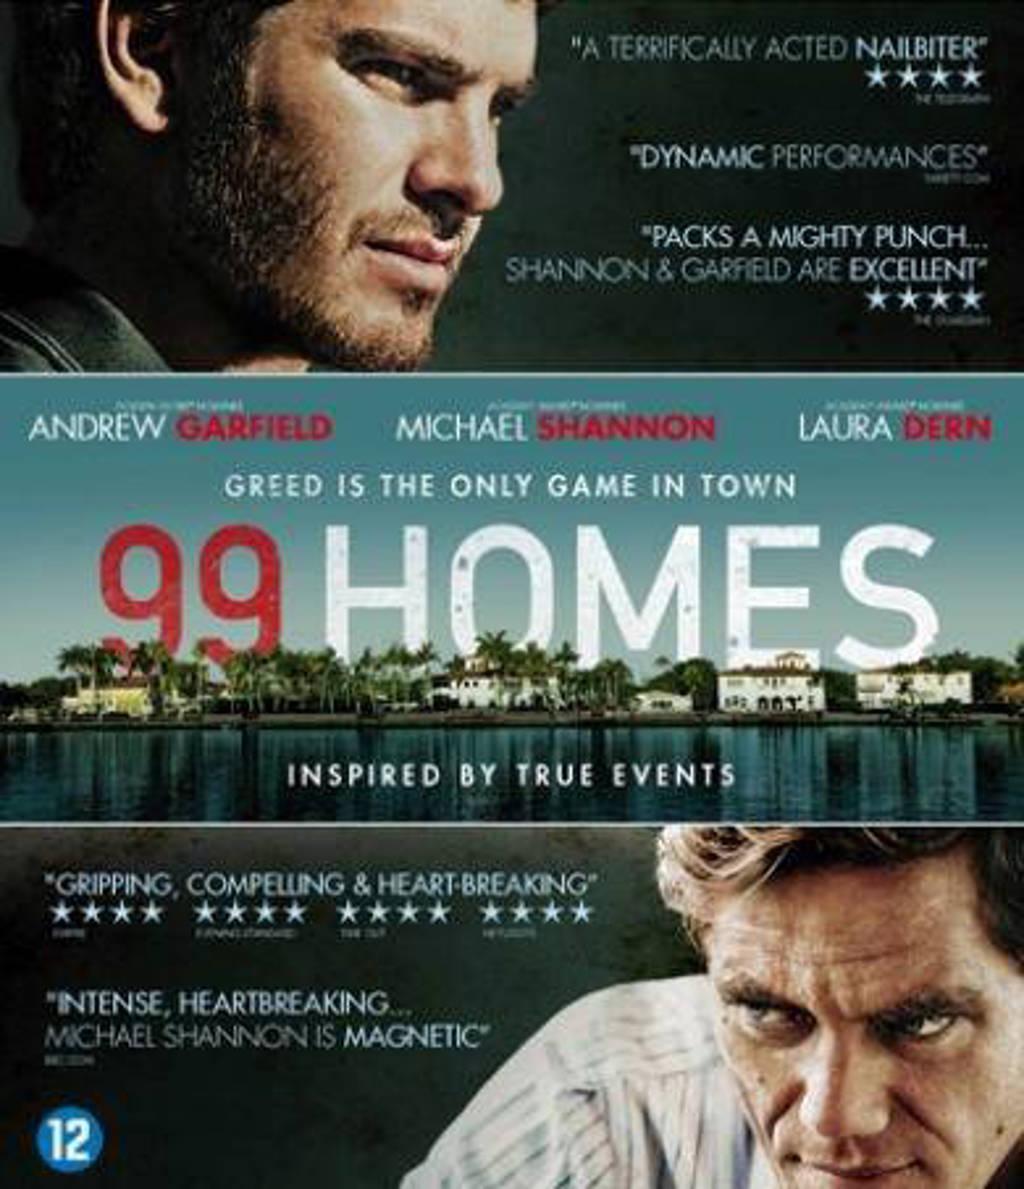 99 homes (Blu-ray)